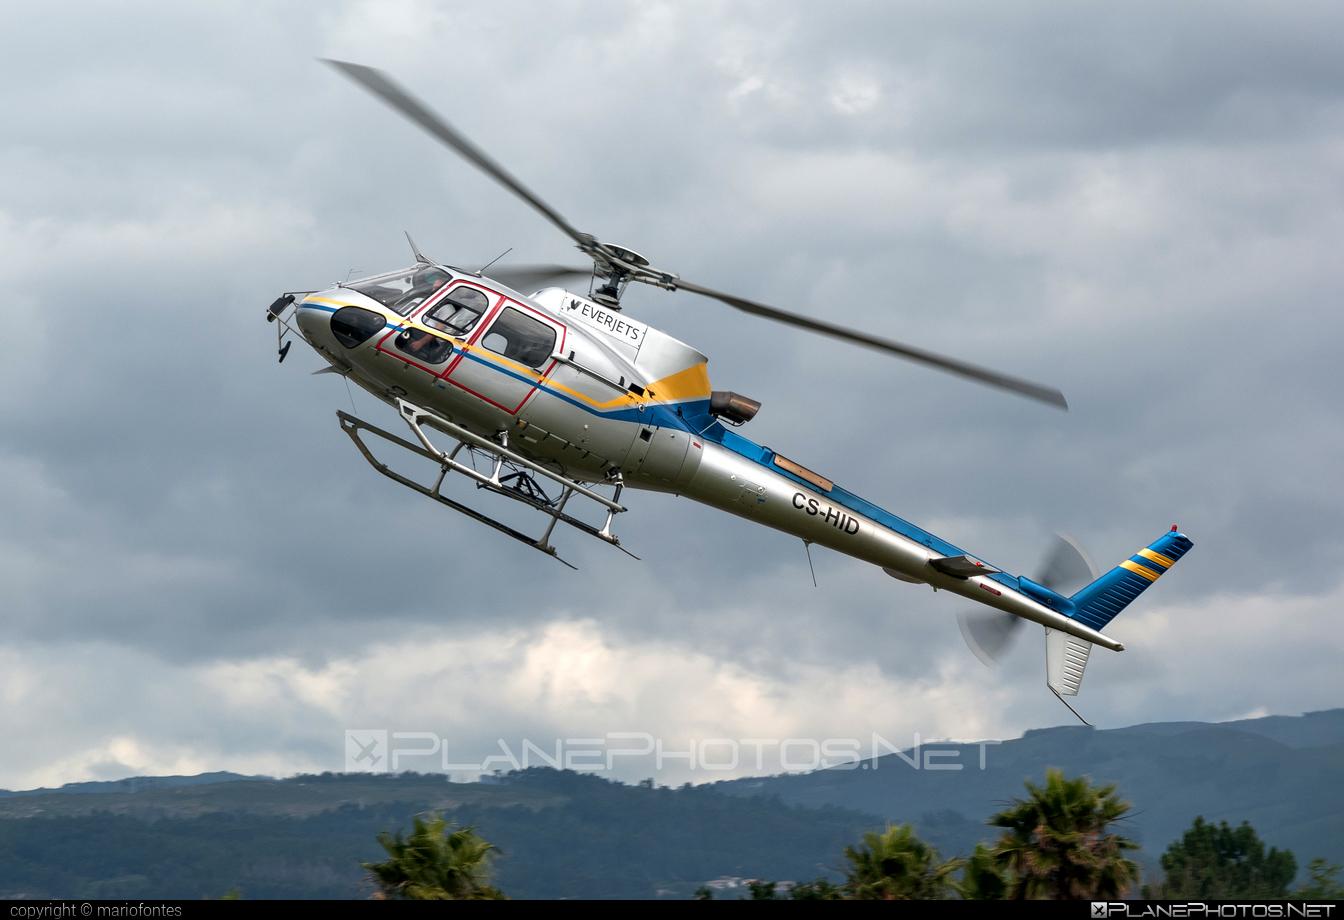 Eurocopter AS350 B3 Ecureuil - CS-HID operated by Everjets - Aviação Executiva, S.A. #eurocopter #everjets